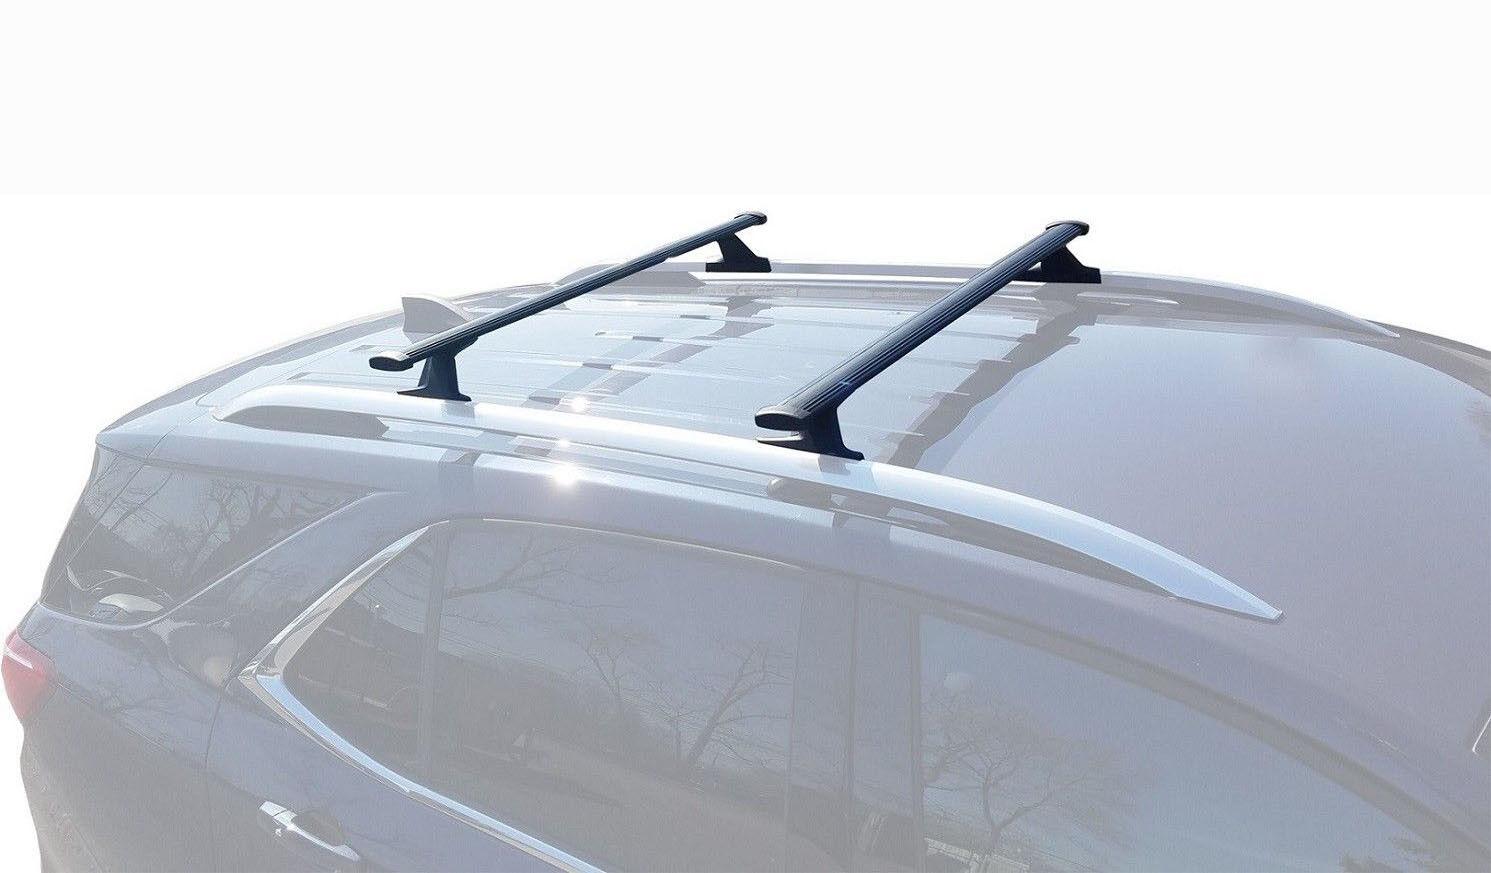 Brightlines Cross Bars Crossbars Roof Racks 2010 2017